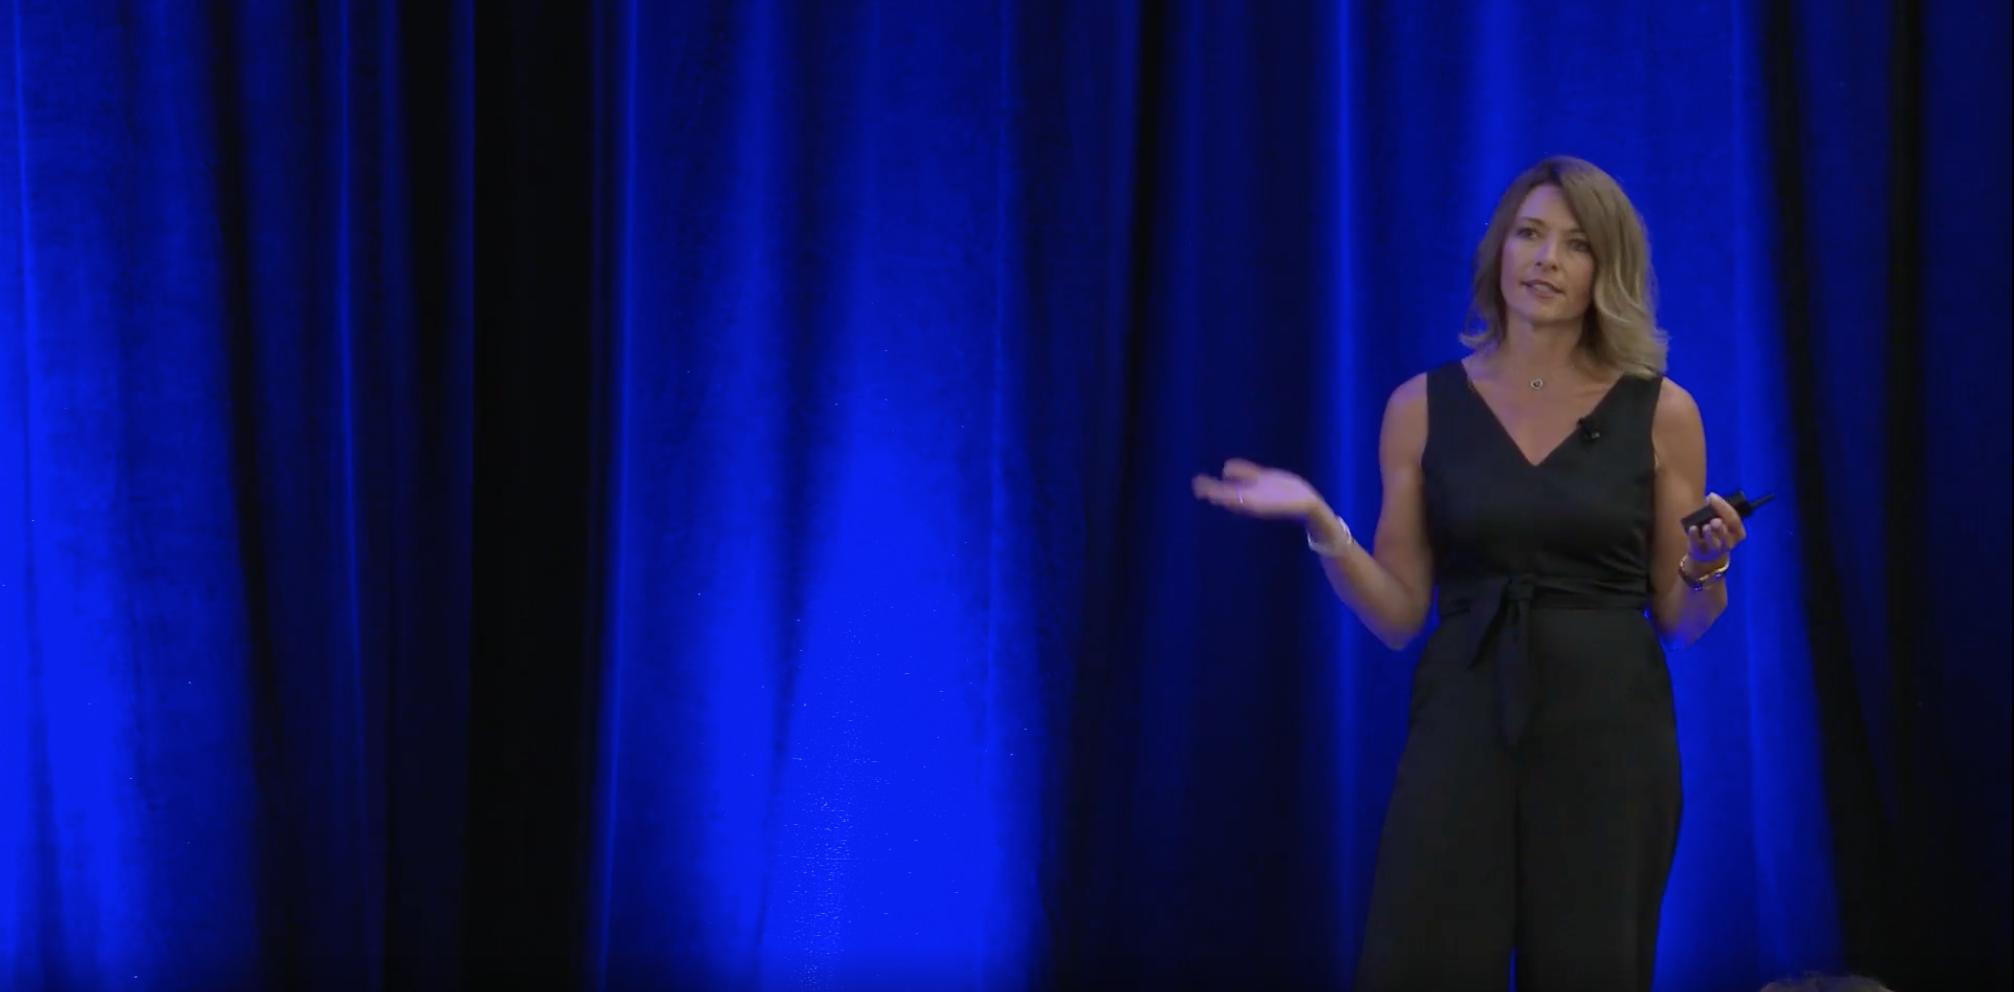 jacqui fleury speaking at the Entrepreneur's Organization of Canada